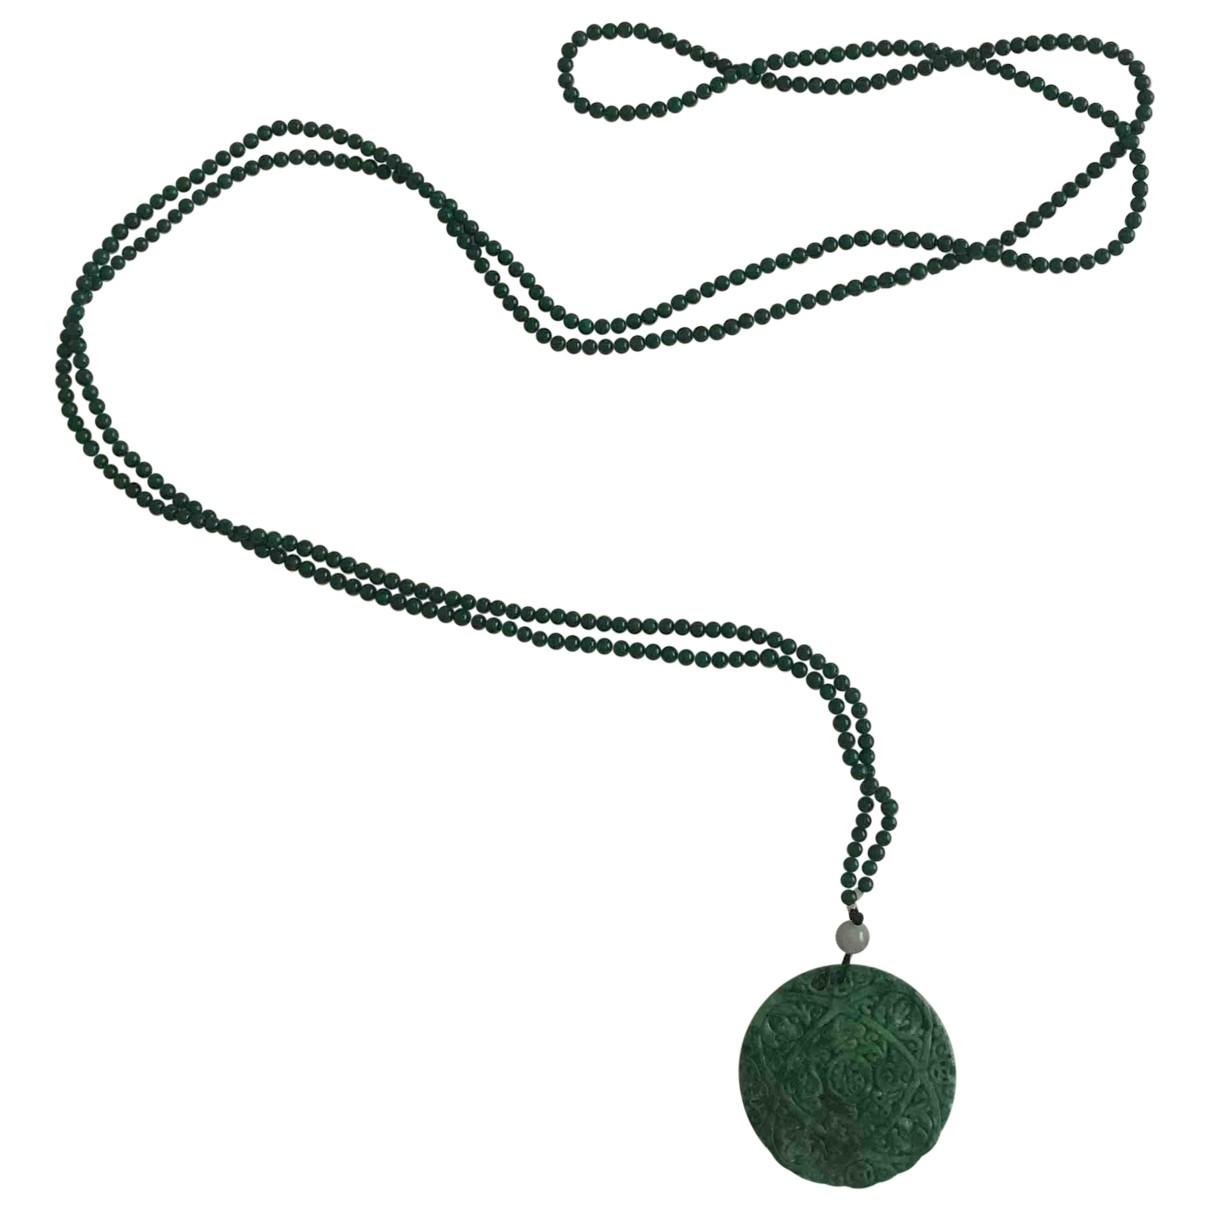 Non Signe / Unsigned Chaines Kette in  Gruen Jade